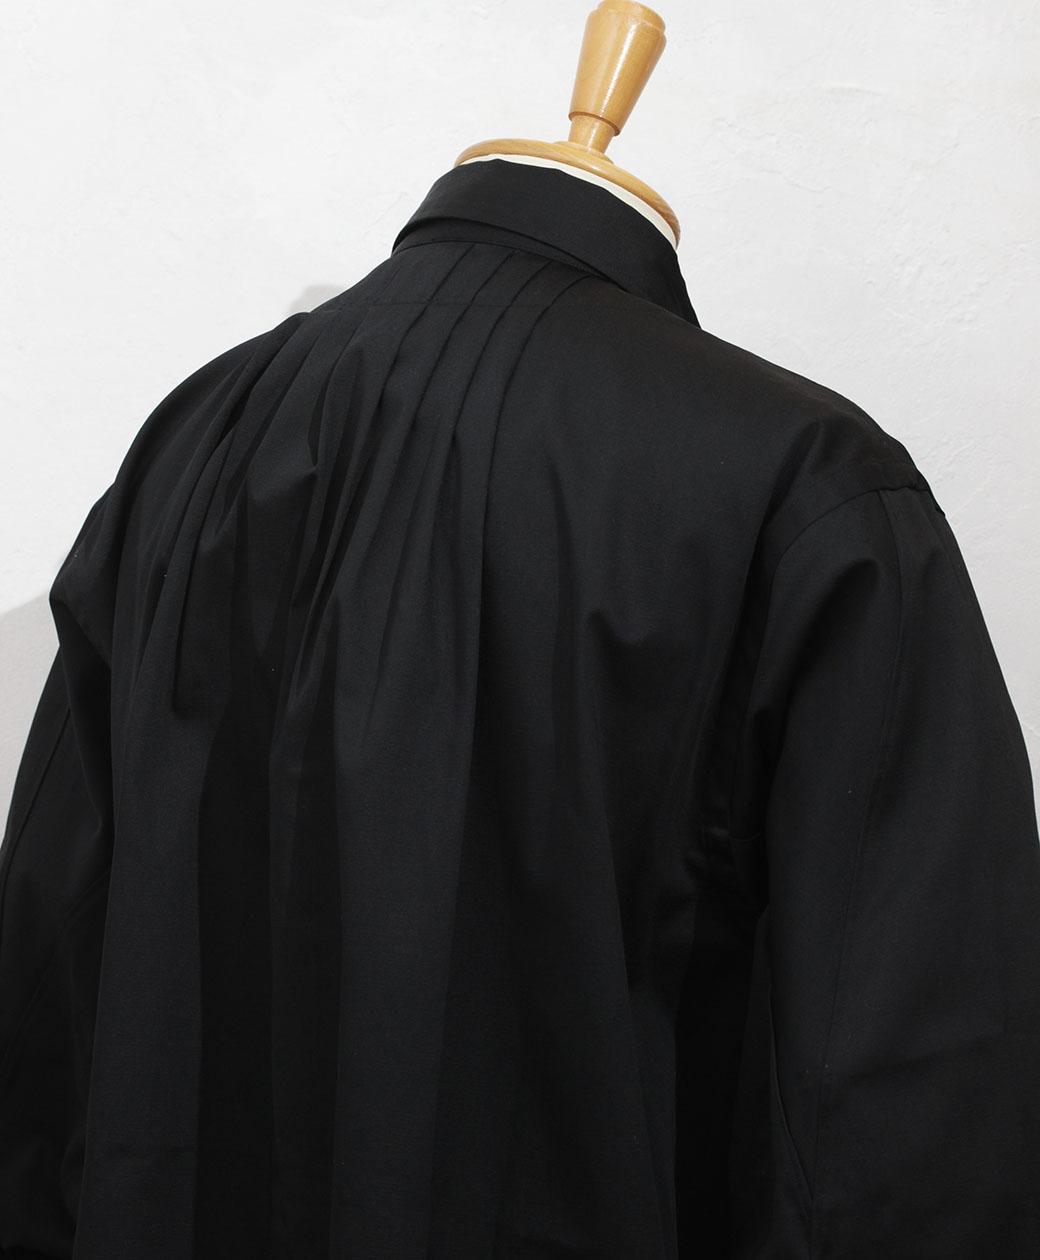 SUNNY ELEMENT Sleeping Shirt(Black)